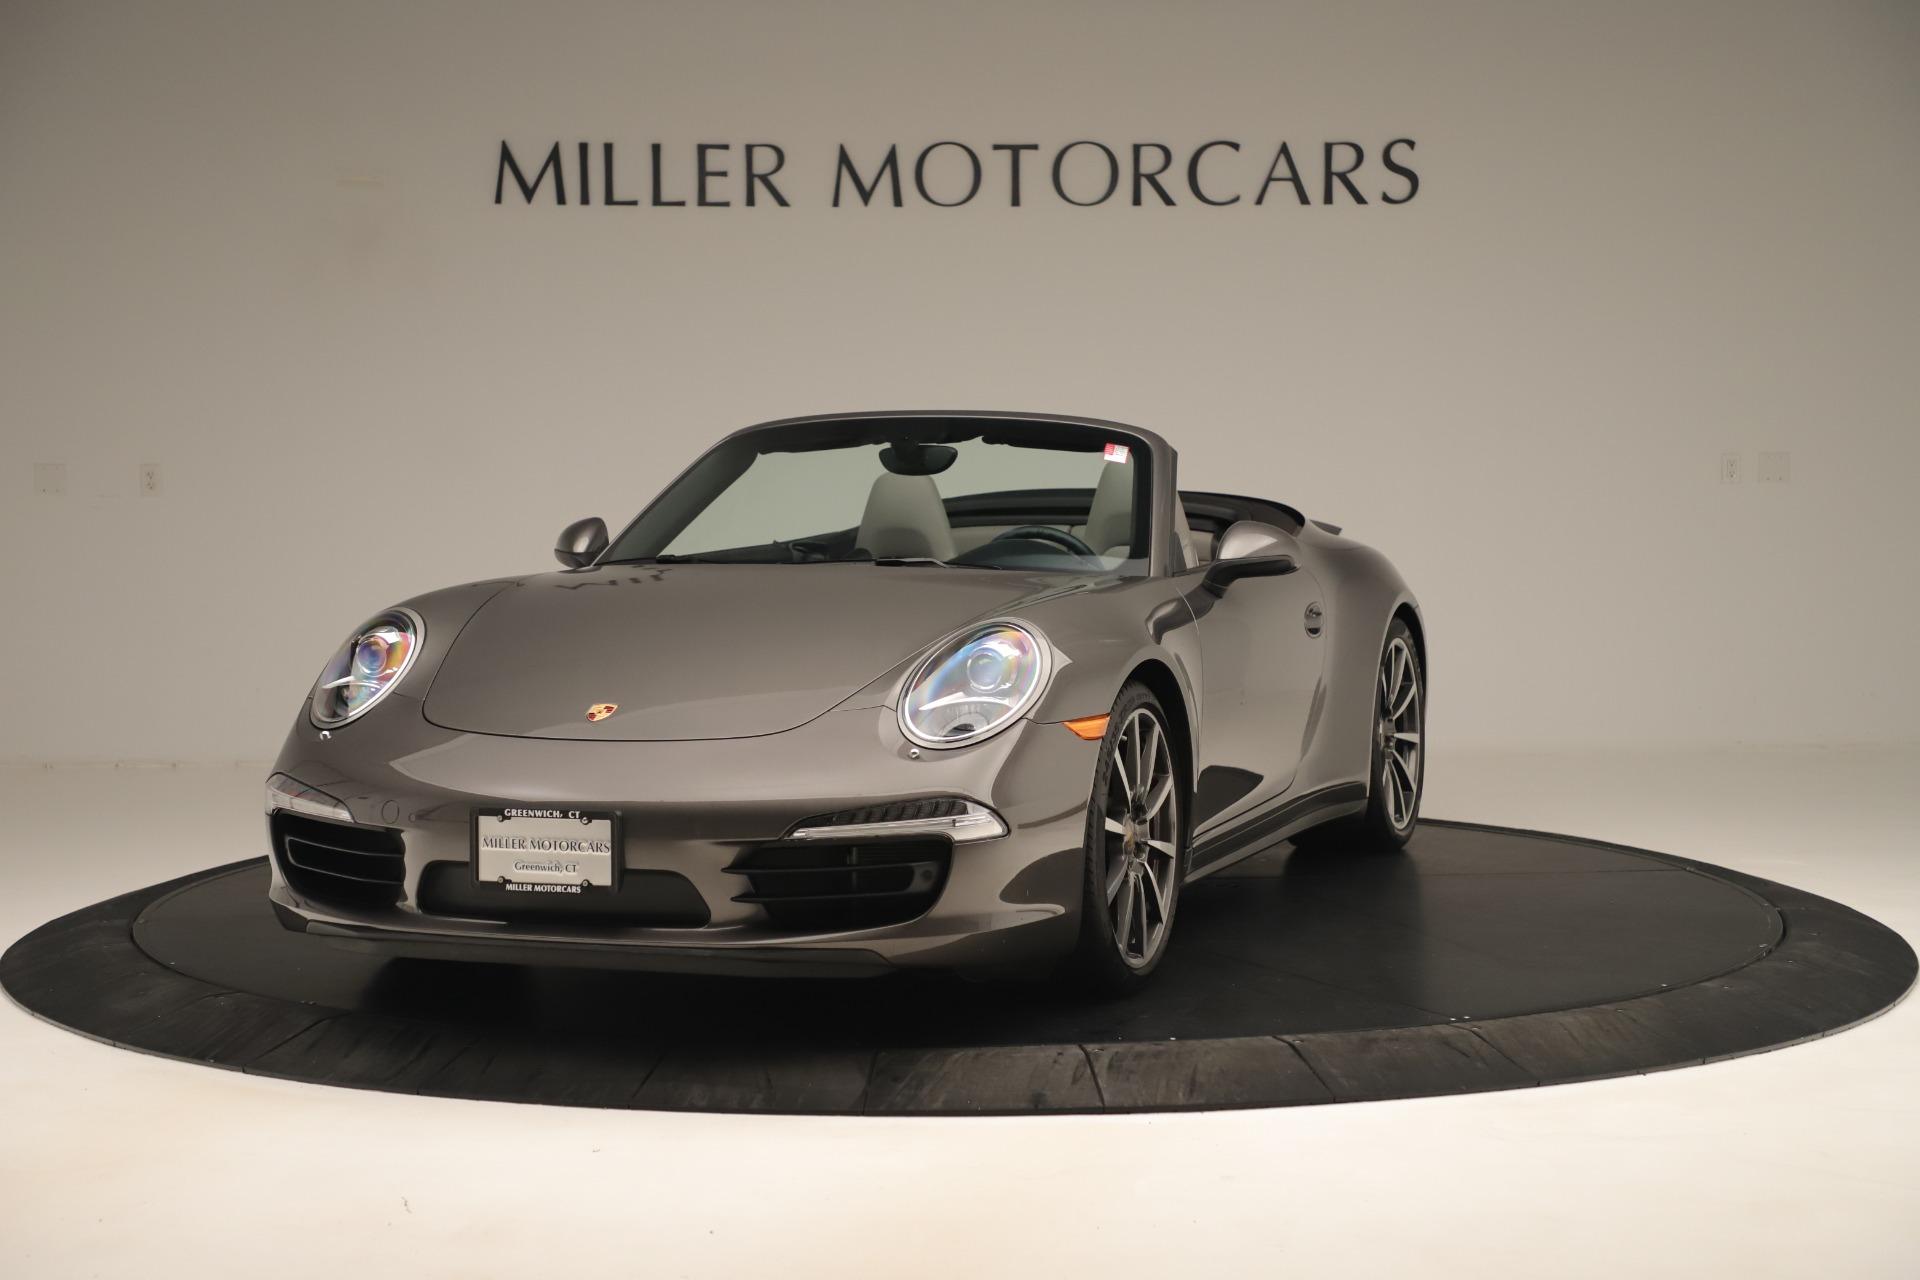 Used 2015 Porsche 911 Carrera 4S for sale Sold at Maserati of Greenwich in Greenwich CT 06830 1